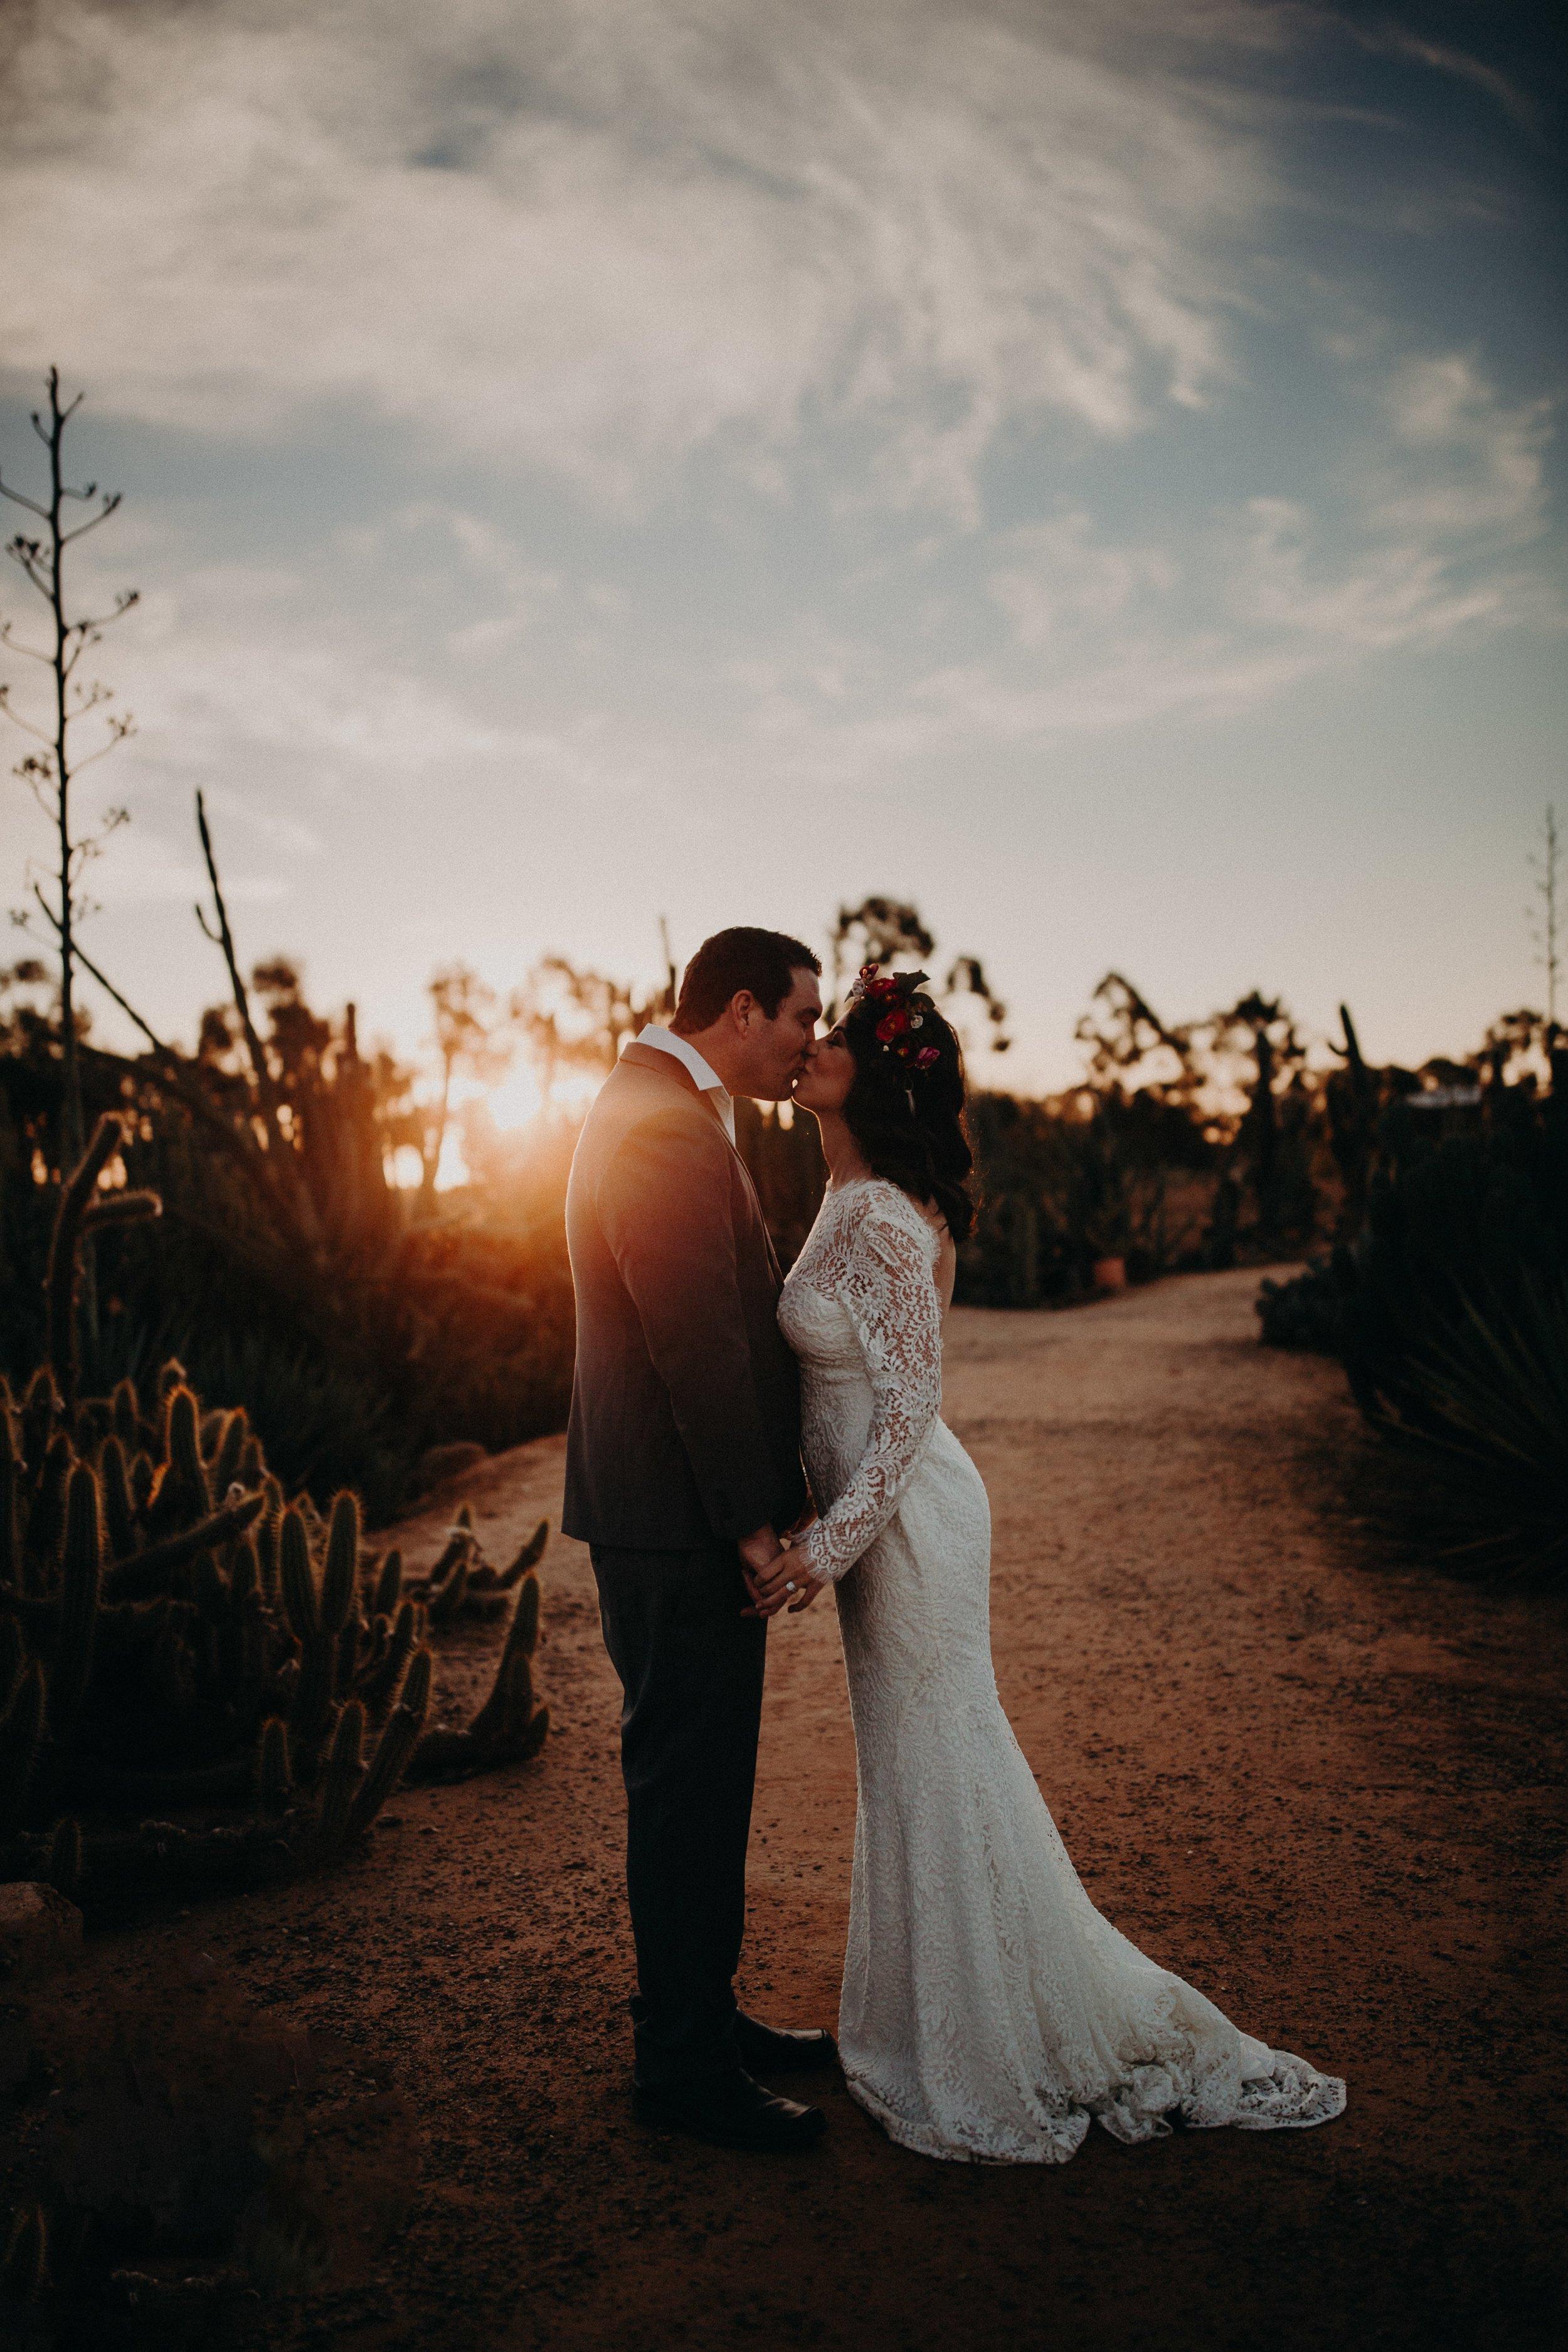 mickalathomas_puremacphotography_weddingphotographer_couplephotographer_Sheppartonphotographer_1461.jpg